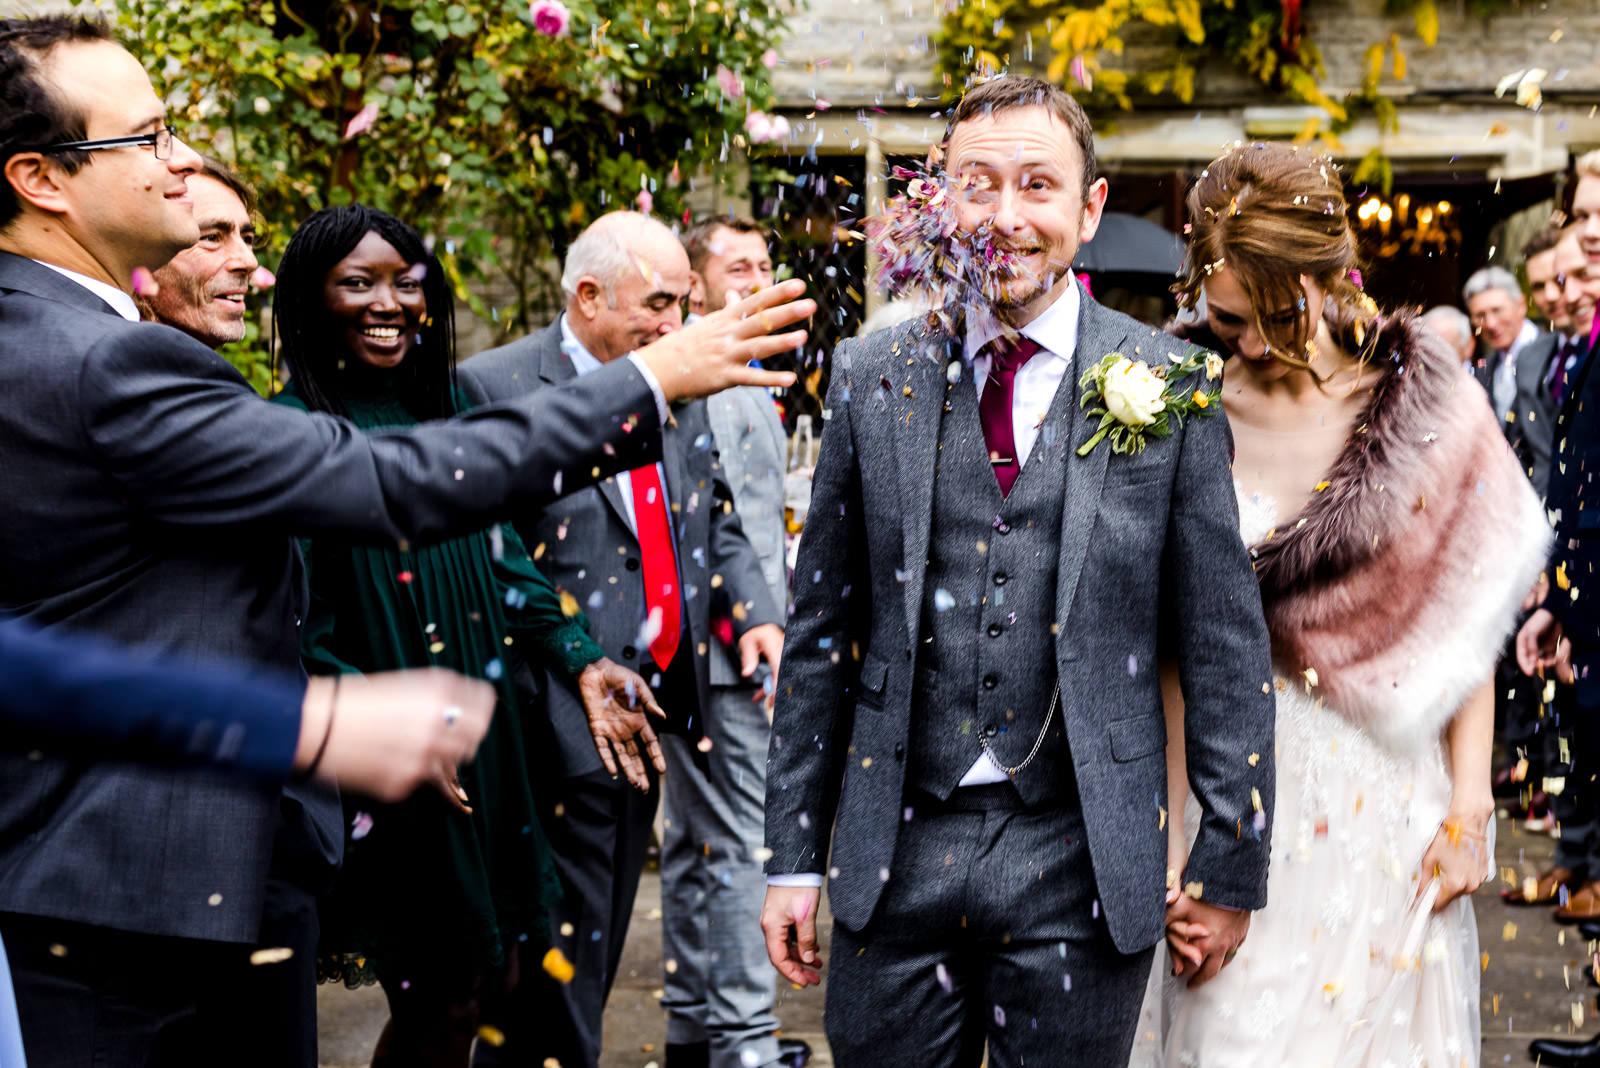 Miskin Manor Wedding Photography - Art by Design Photography - Confetti3